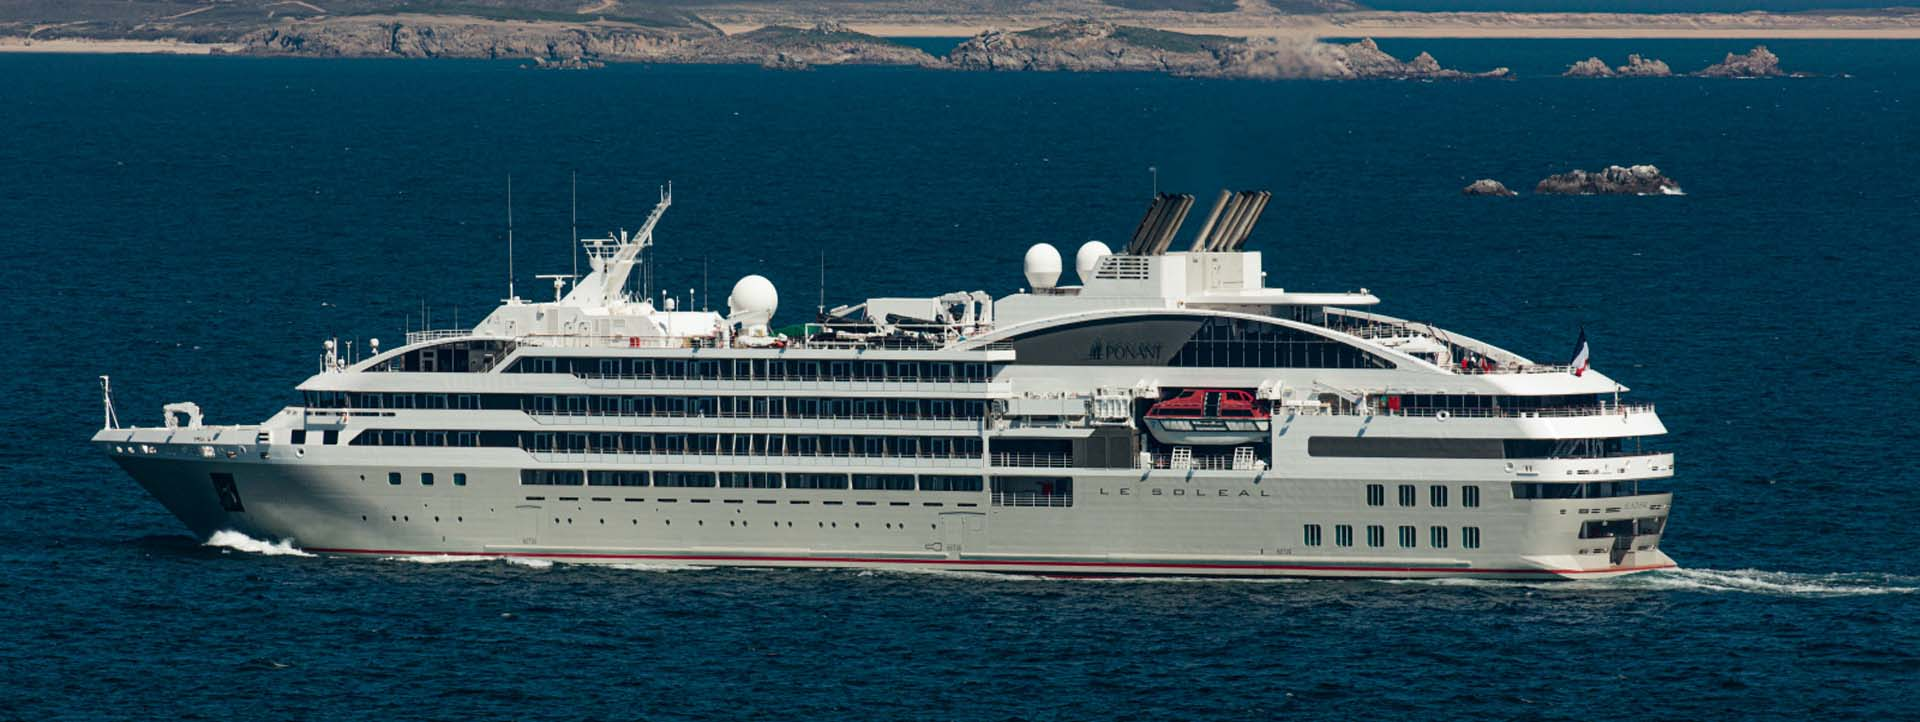 LE SOLEAL side profile Kimberley cruises